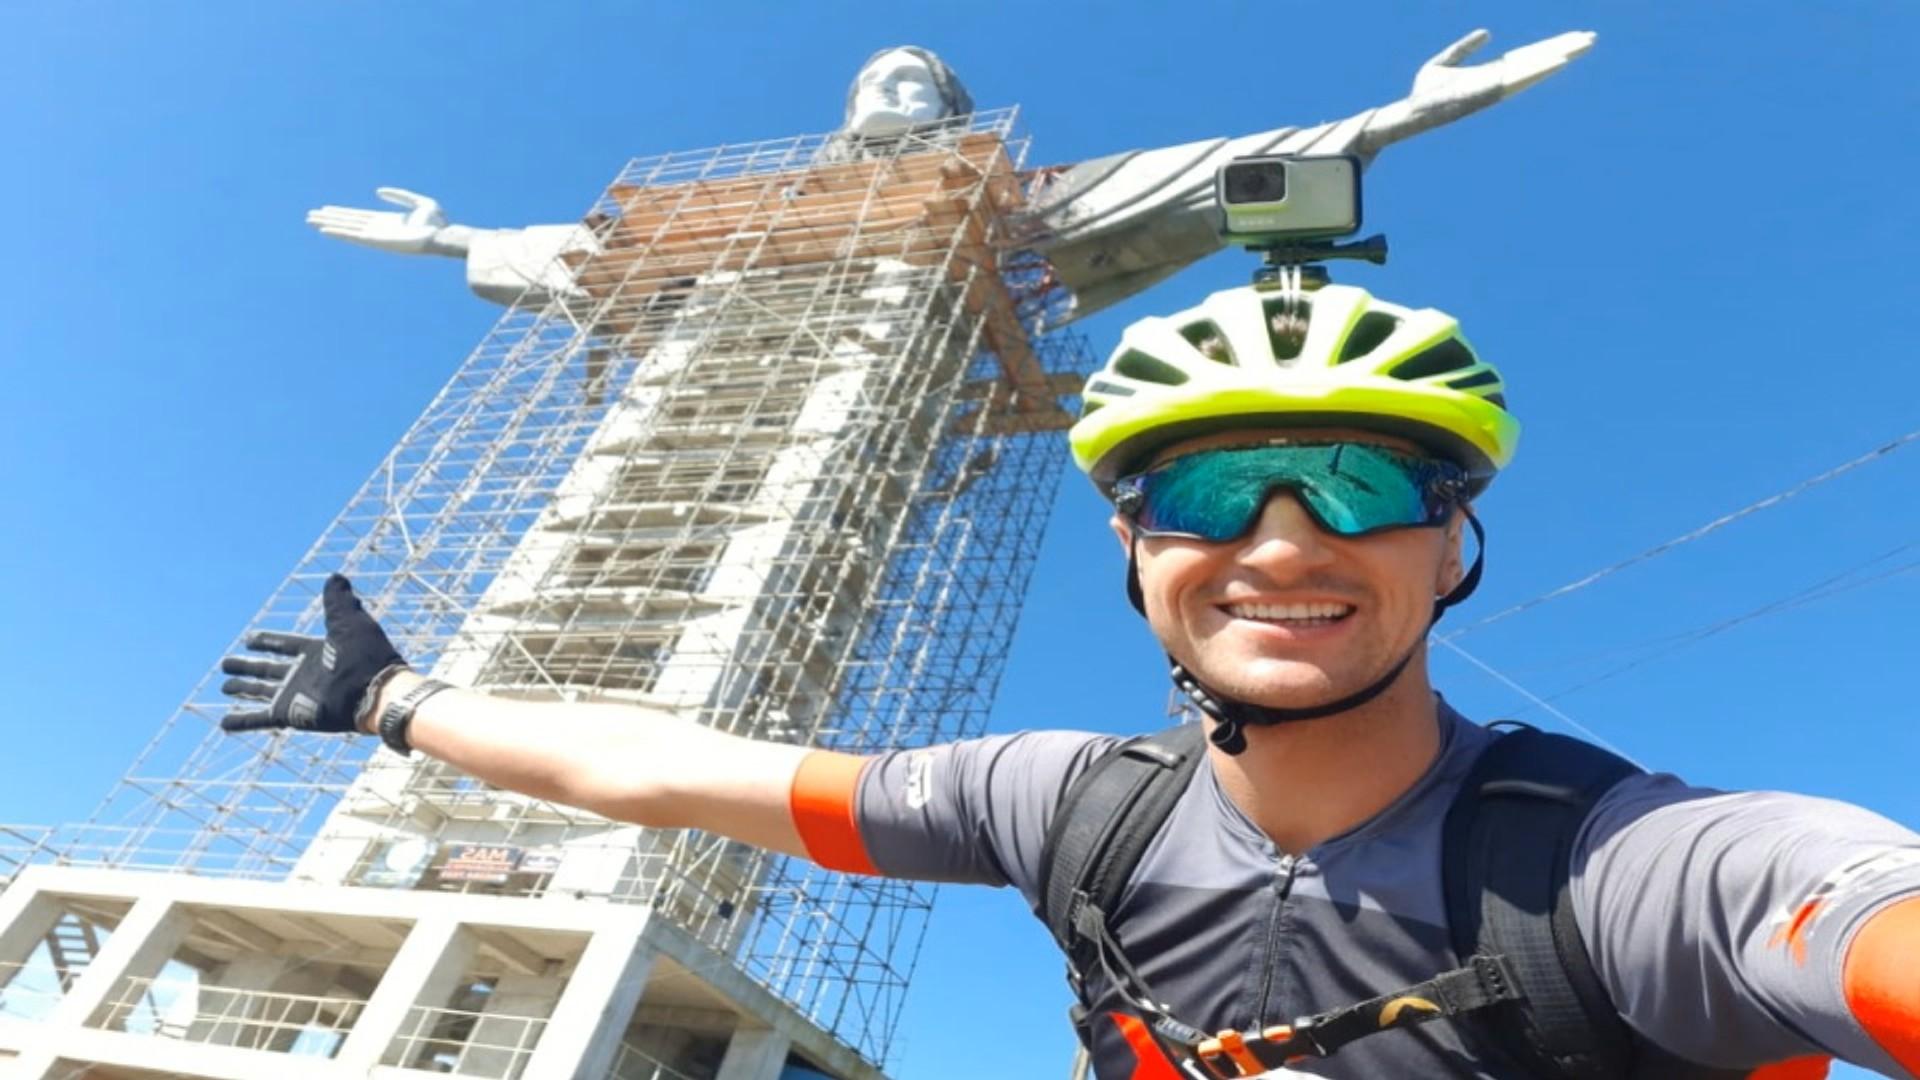 Bombeiro percorre de bicicleta trajeto de 1,5 mil km entre Cristo de Encantado e do Rio de Janeiro